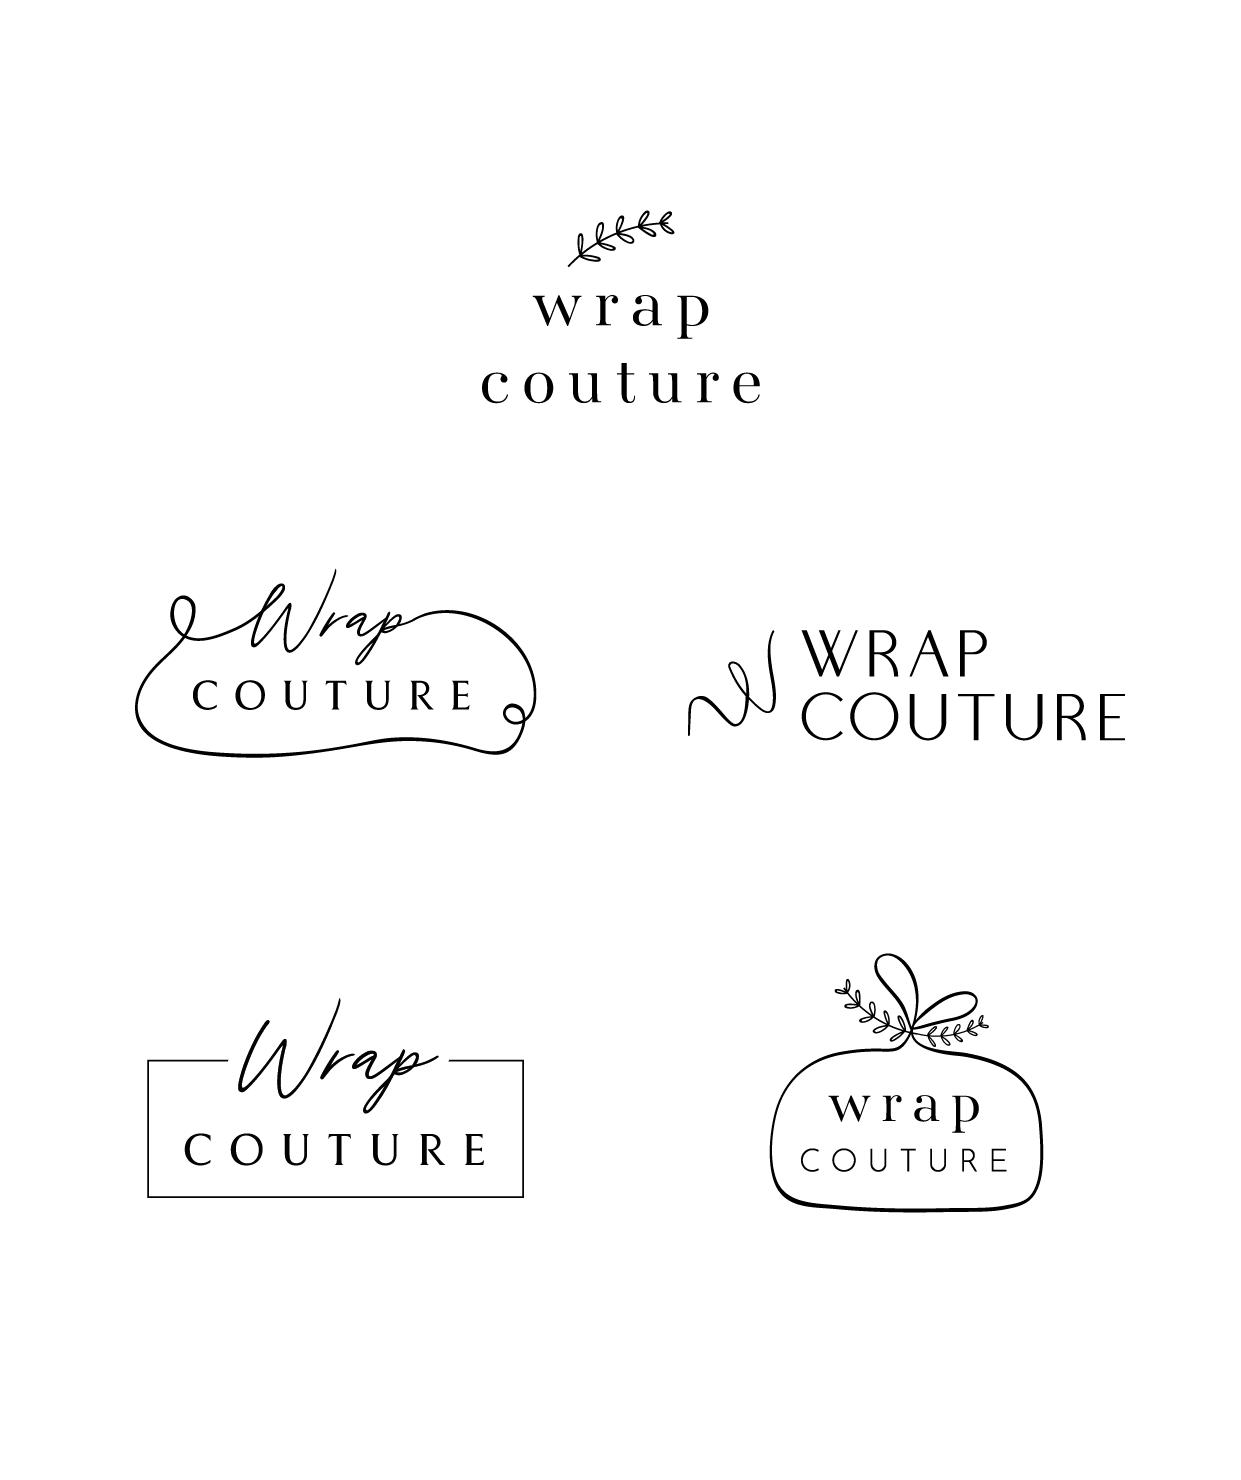 graphic-designer-cornwall-wrap-couture-illustrator